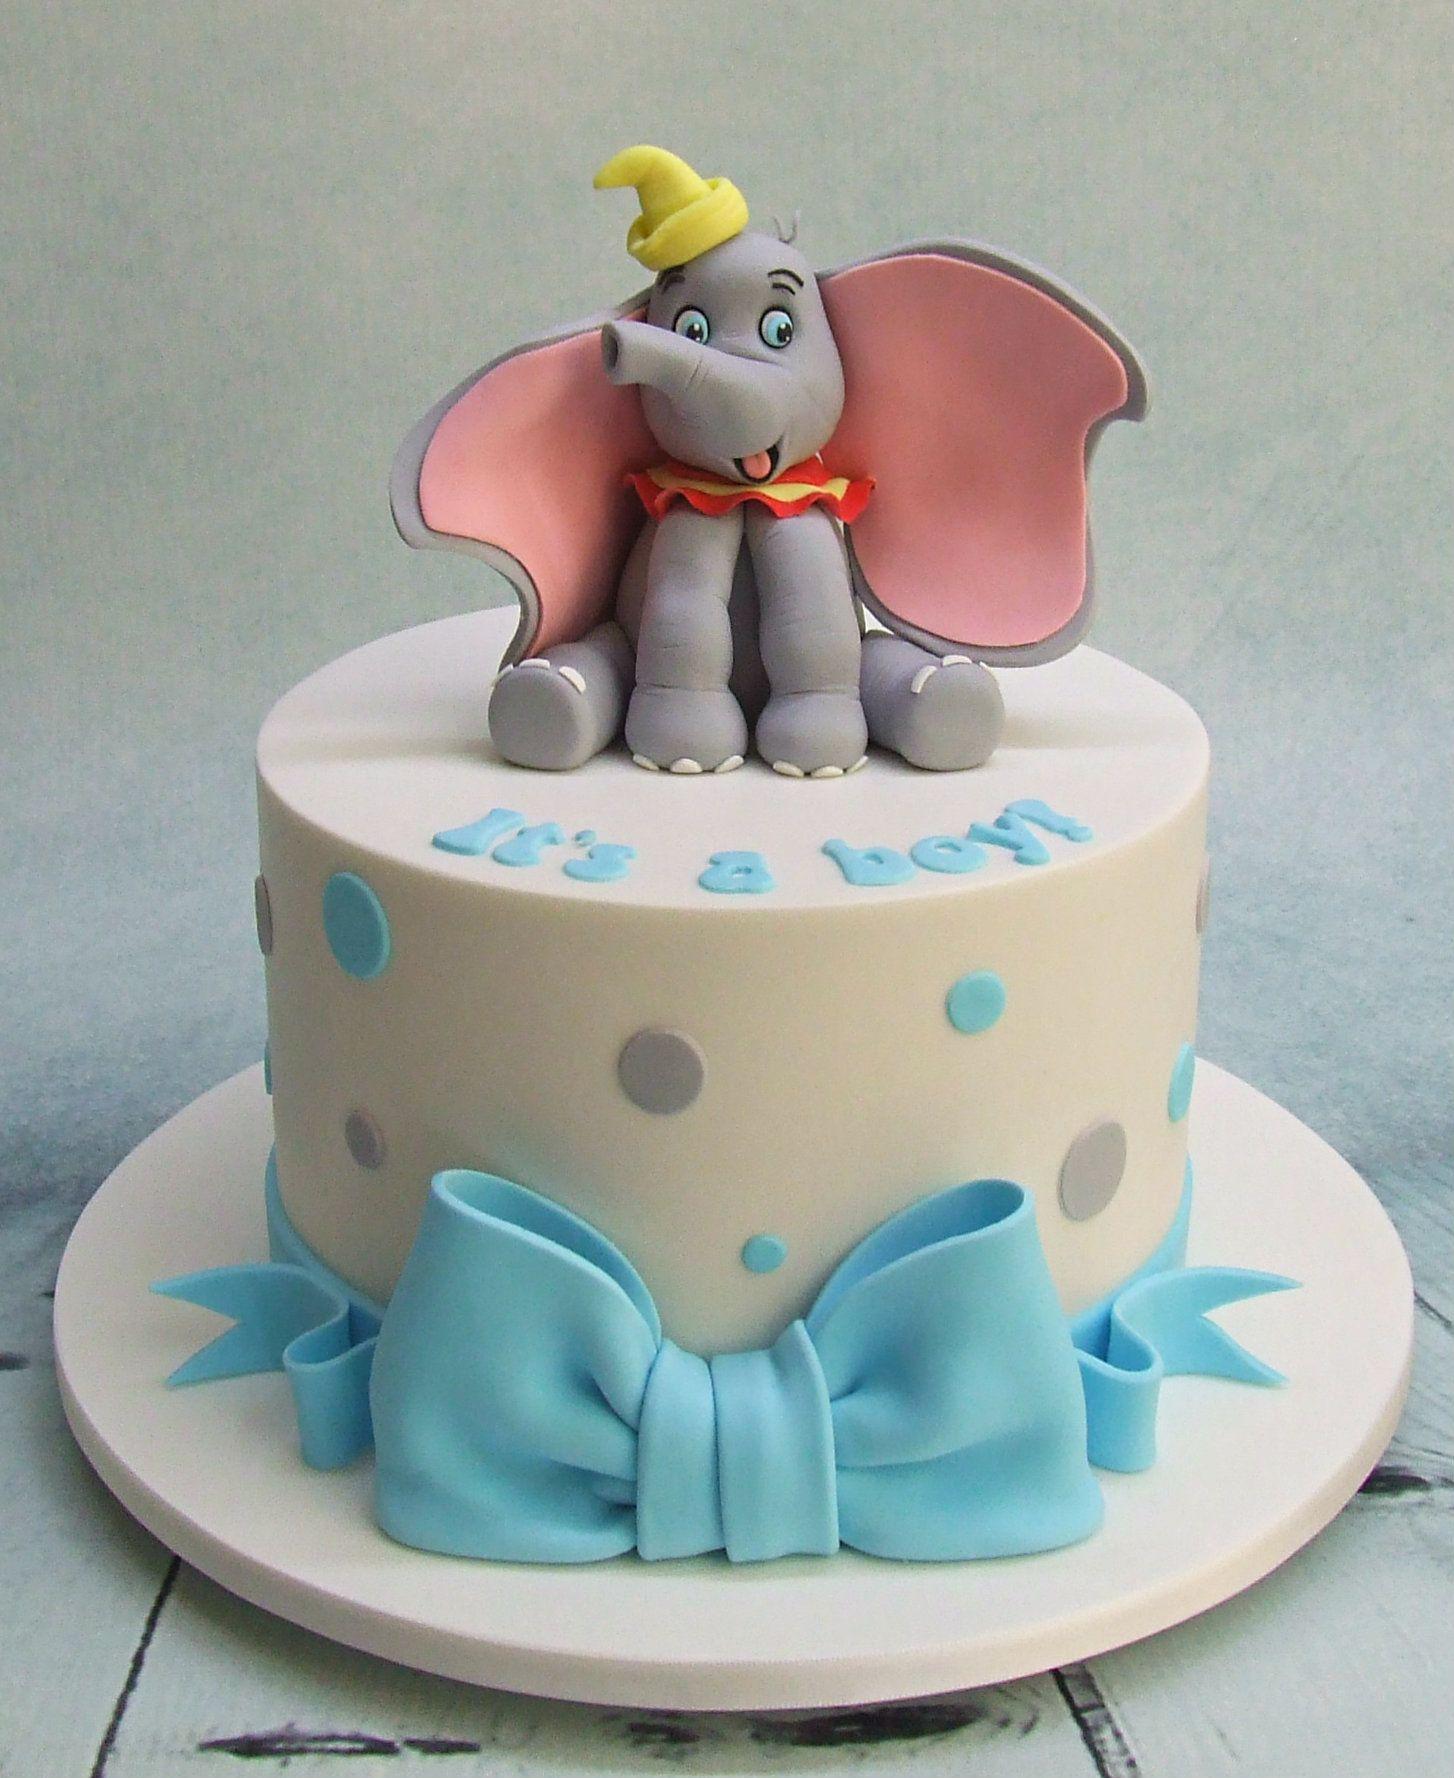 Dumbo Baby Shower Cake Dumbo Baby Shower Dumbo Baby Shower Theme Baby Shower Desserts